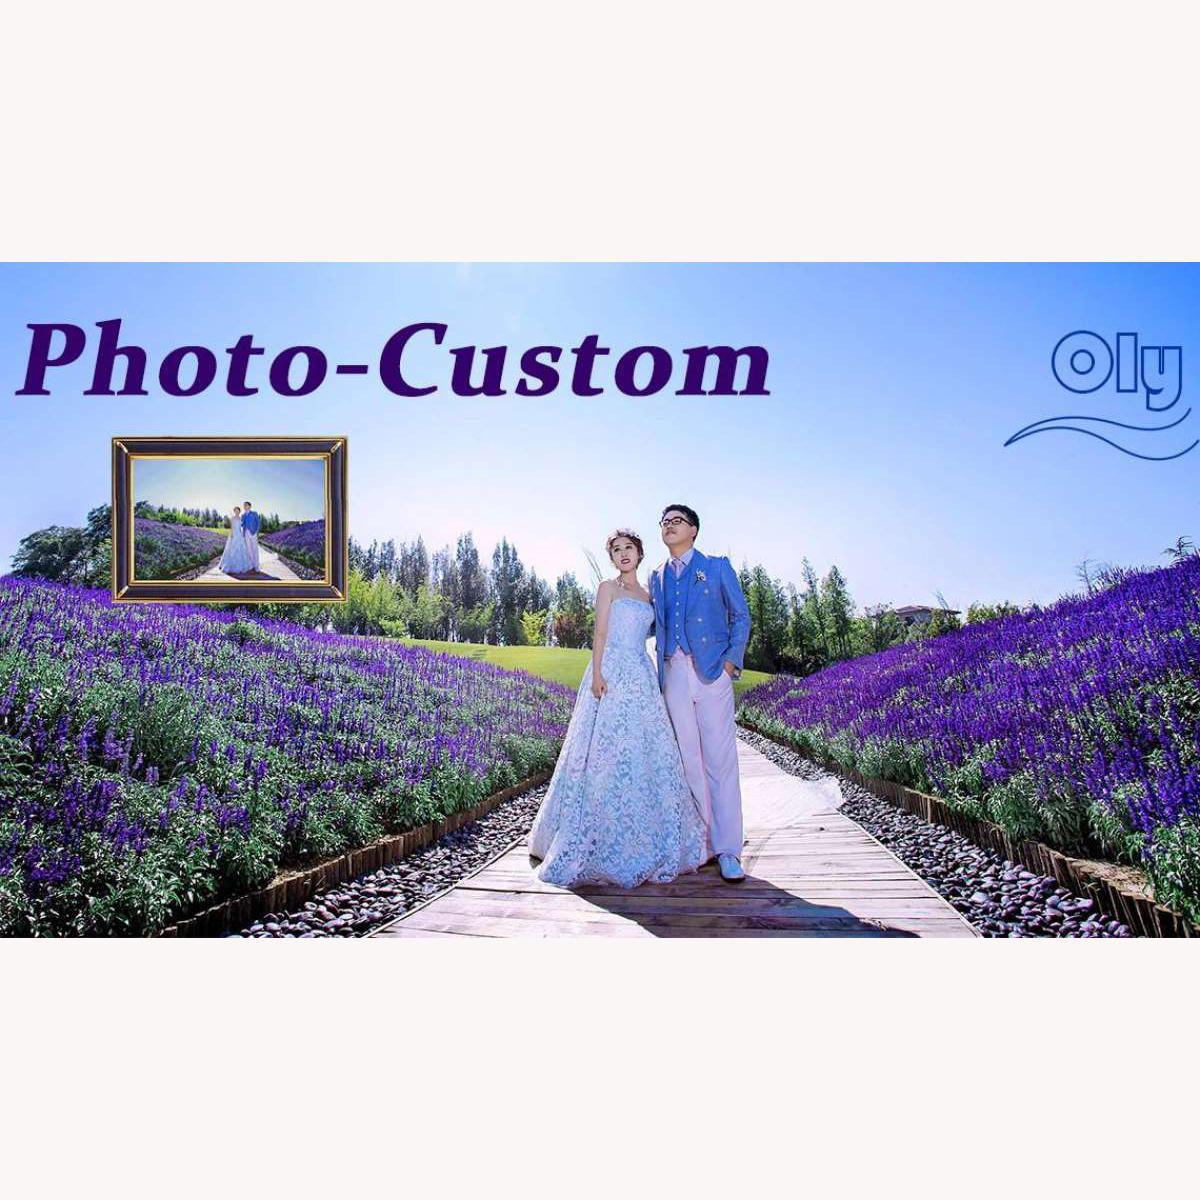 Oly Oem Customization Photo Custom Diy Diamond Painting Full Drill Full Bead Caustom Made Gift